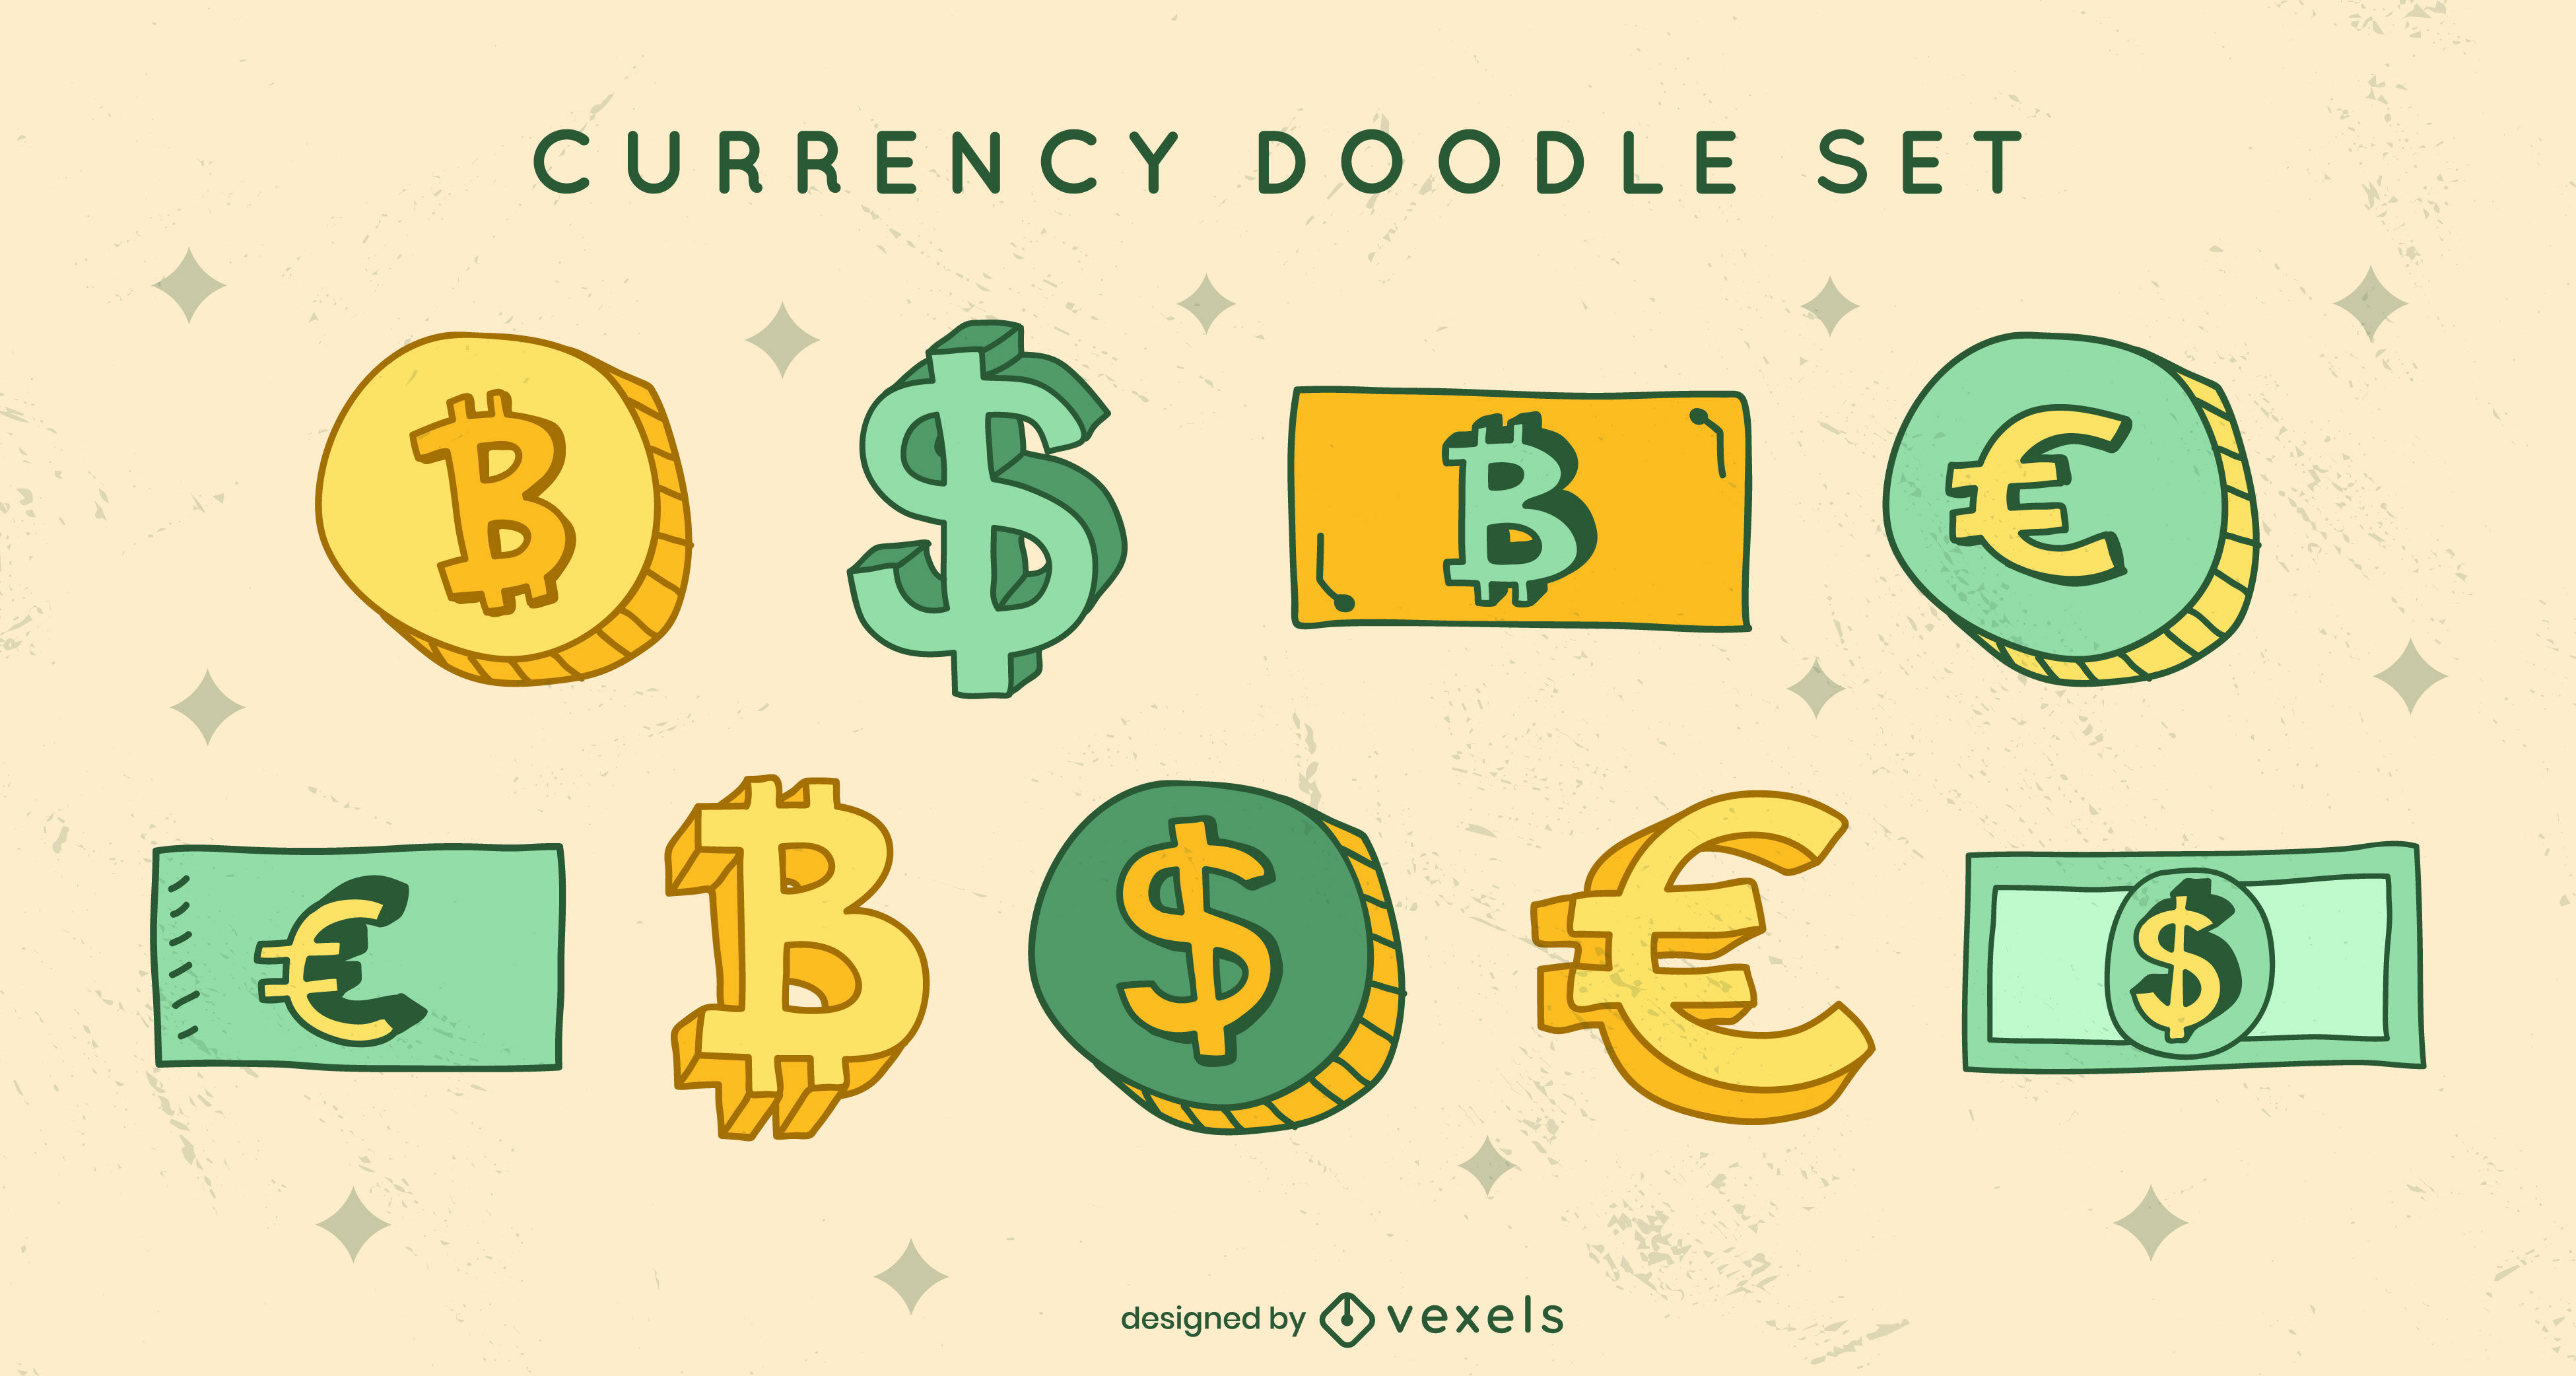 Conjunto de doodle de moedas e notas de pagamento de moeda